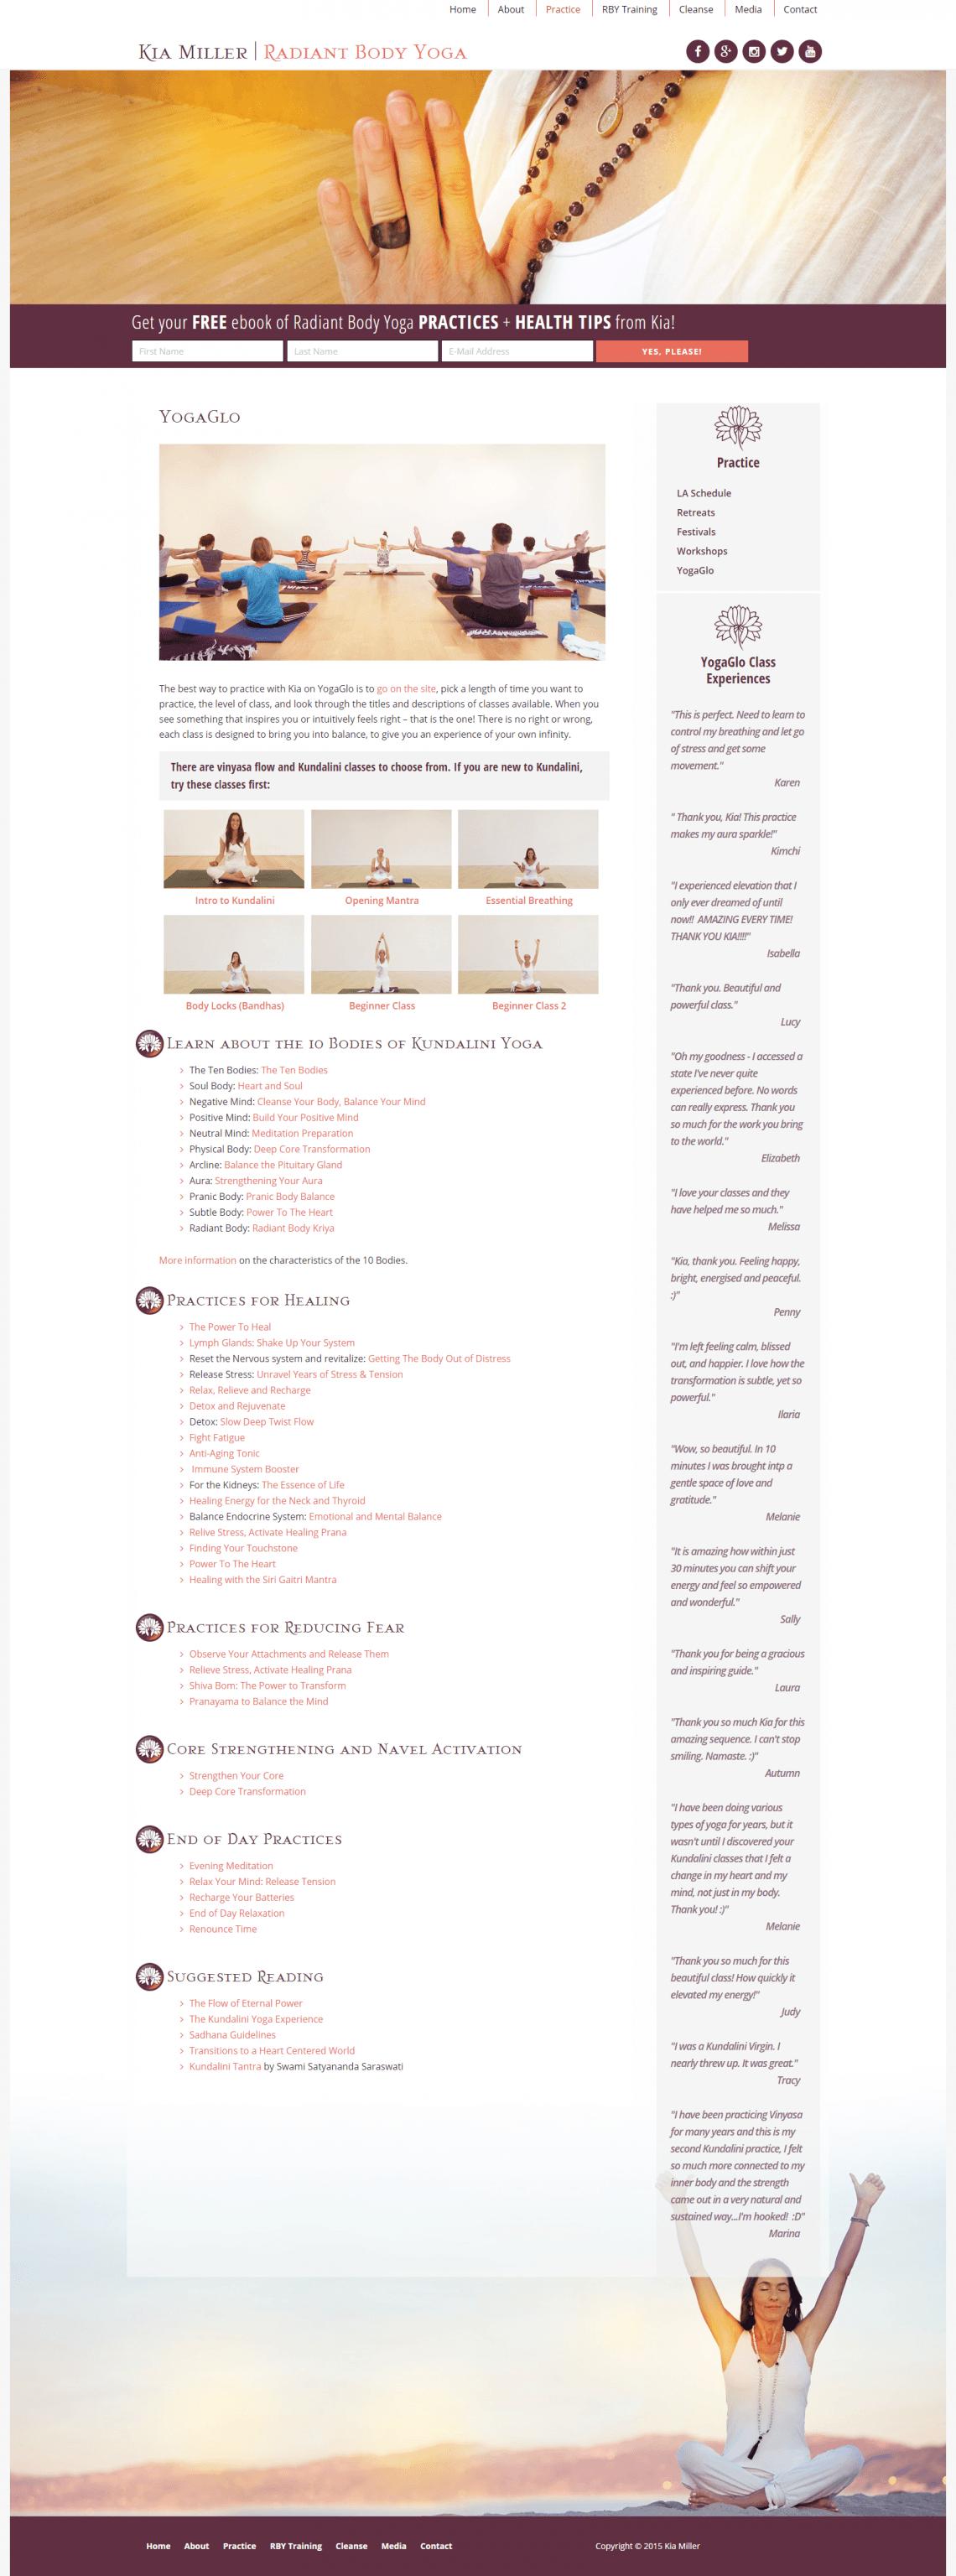 Practice: Kia Miller's Classes on YogaGlo